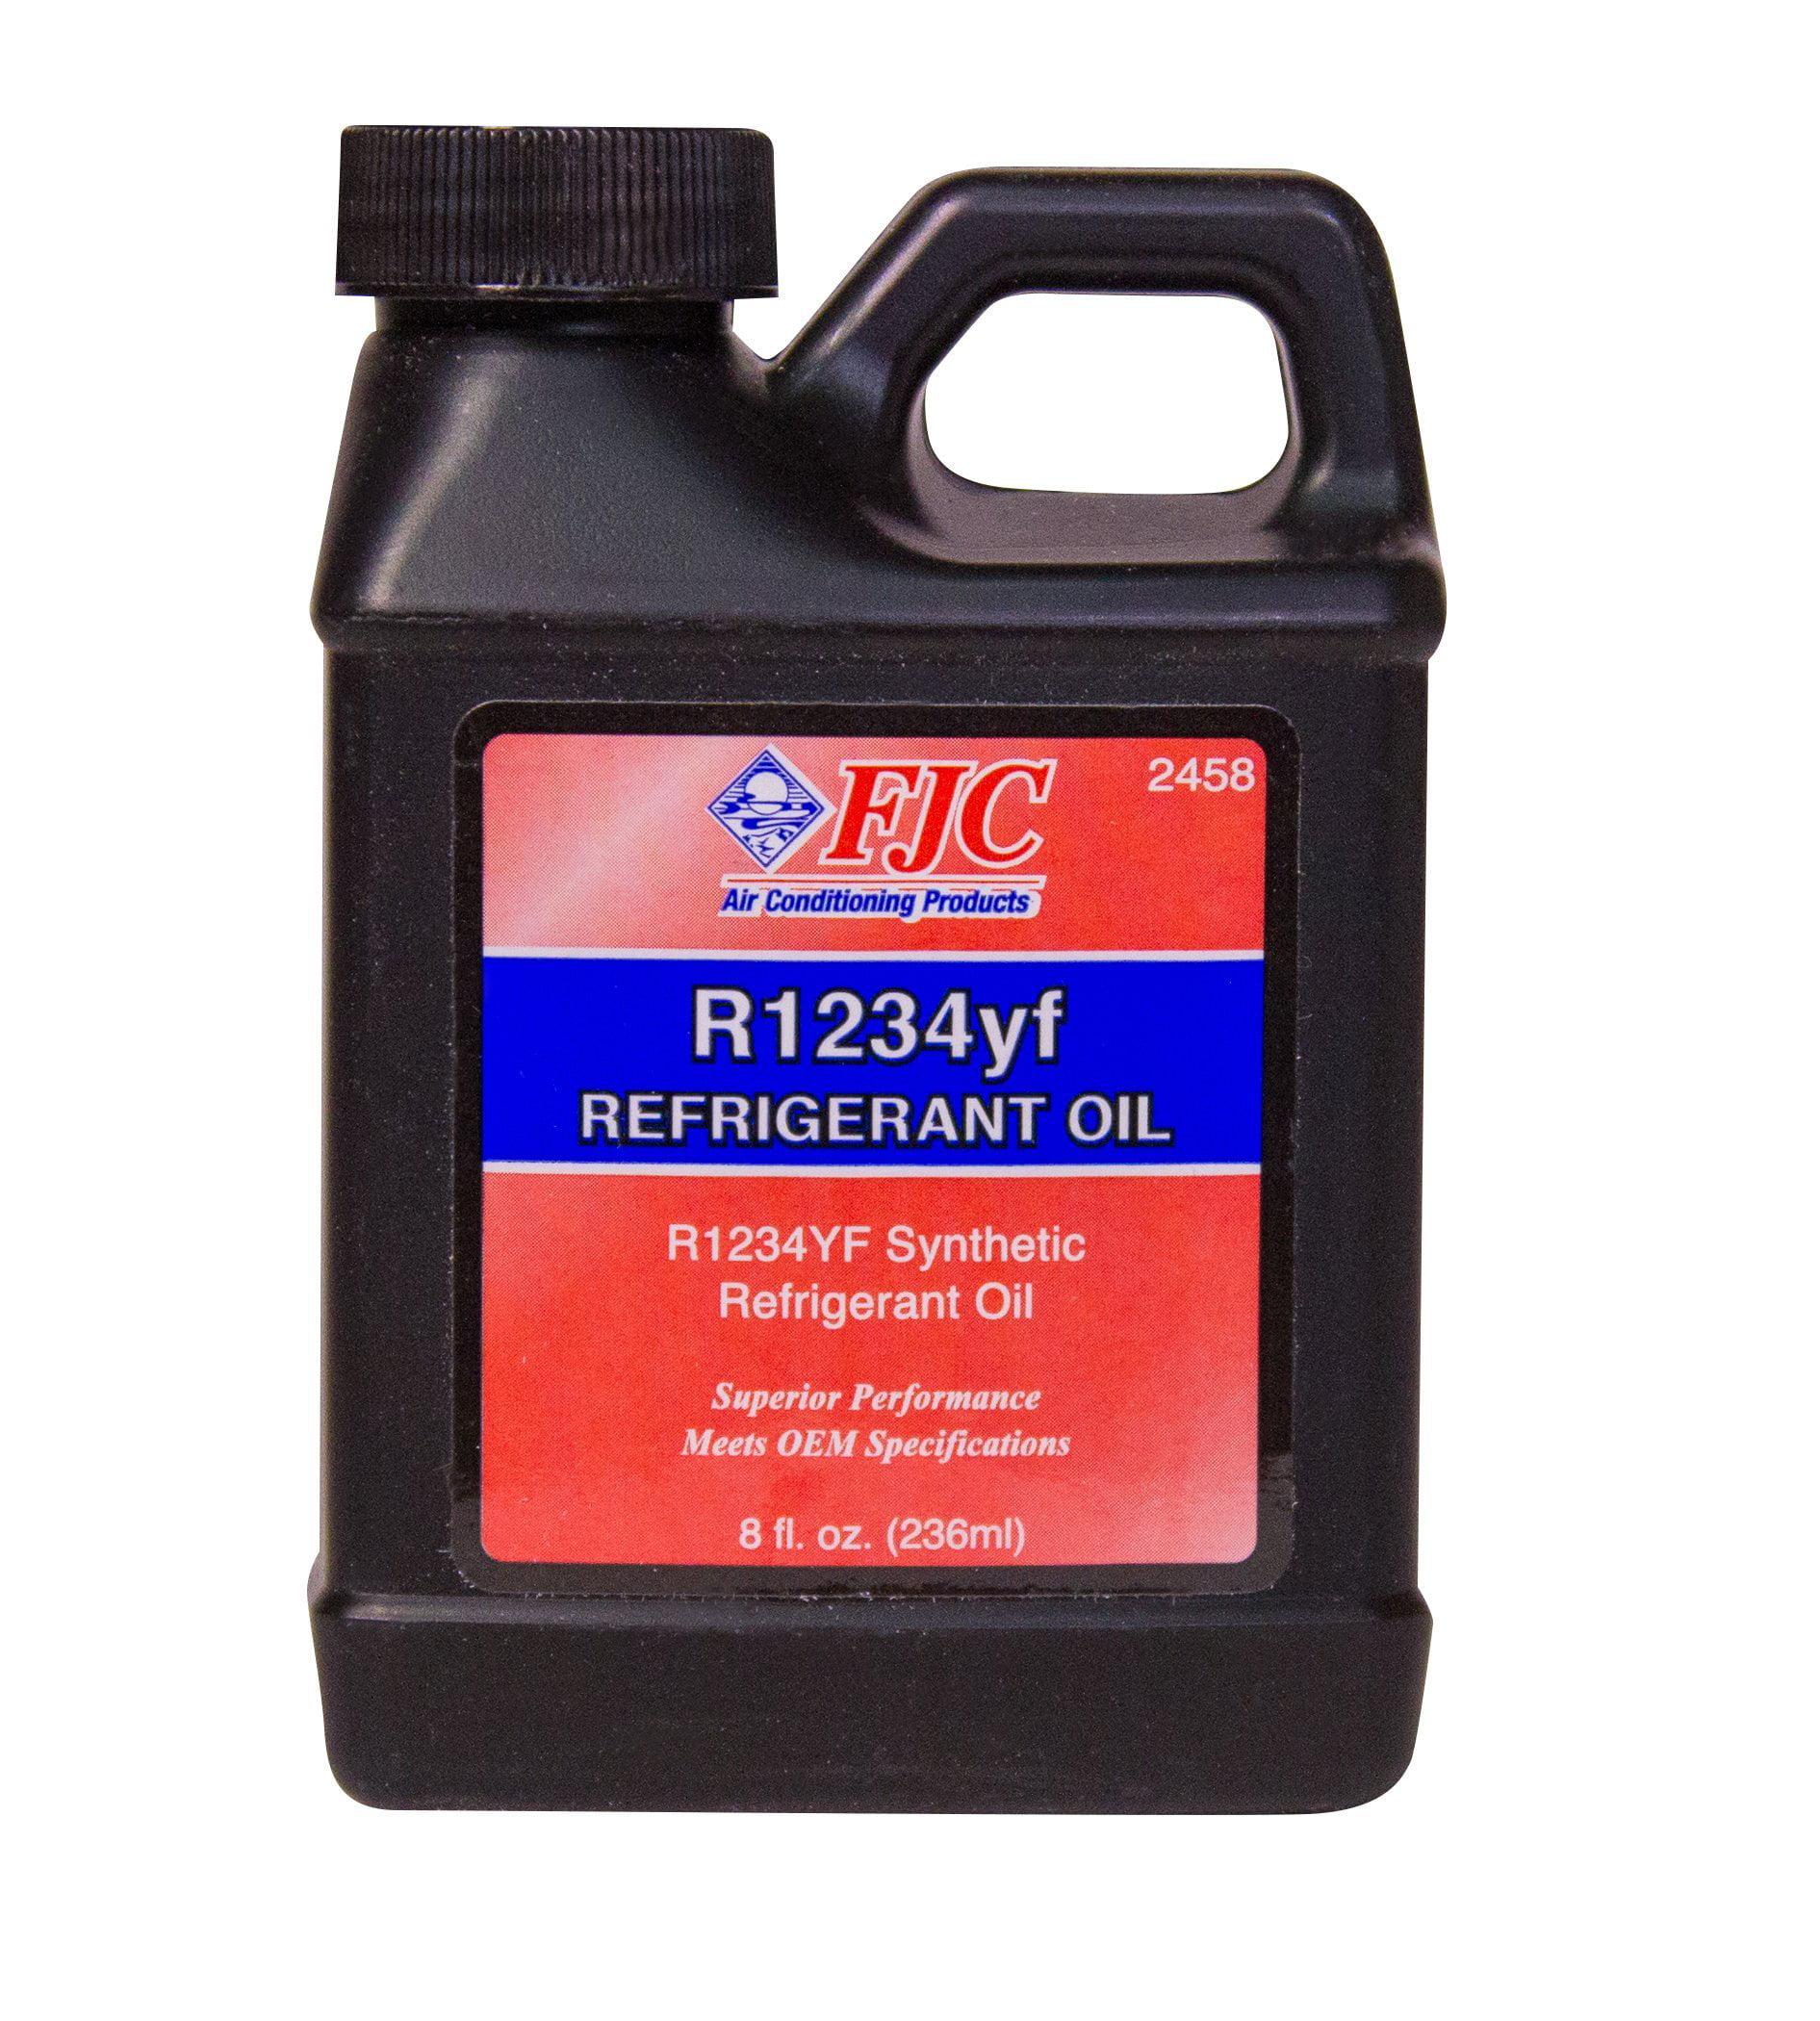 Fjc, Inc. 2458 8 Oz. R1234yf Refrigerant Oil